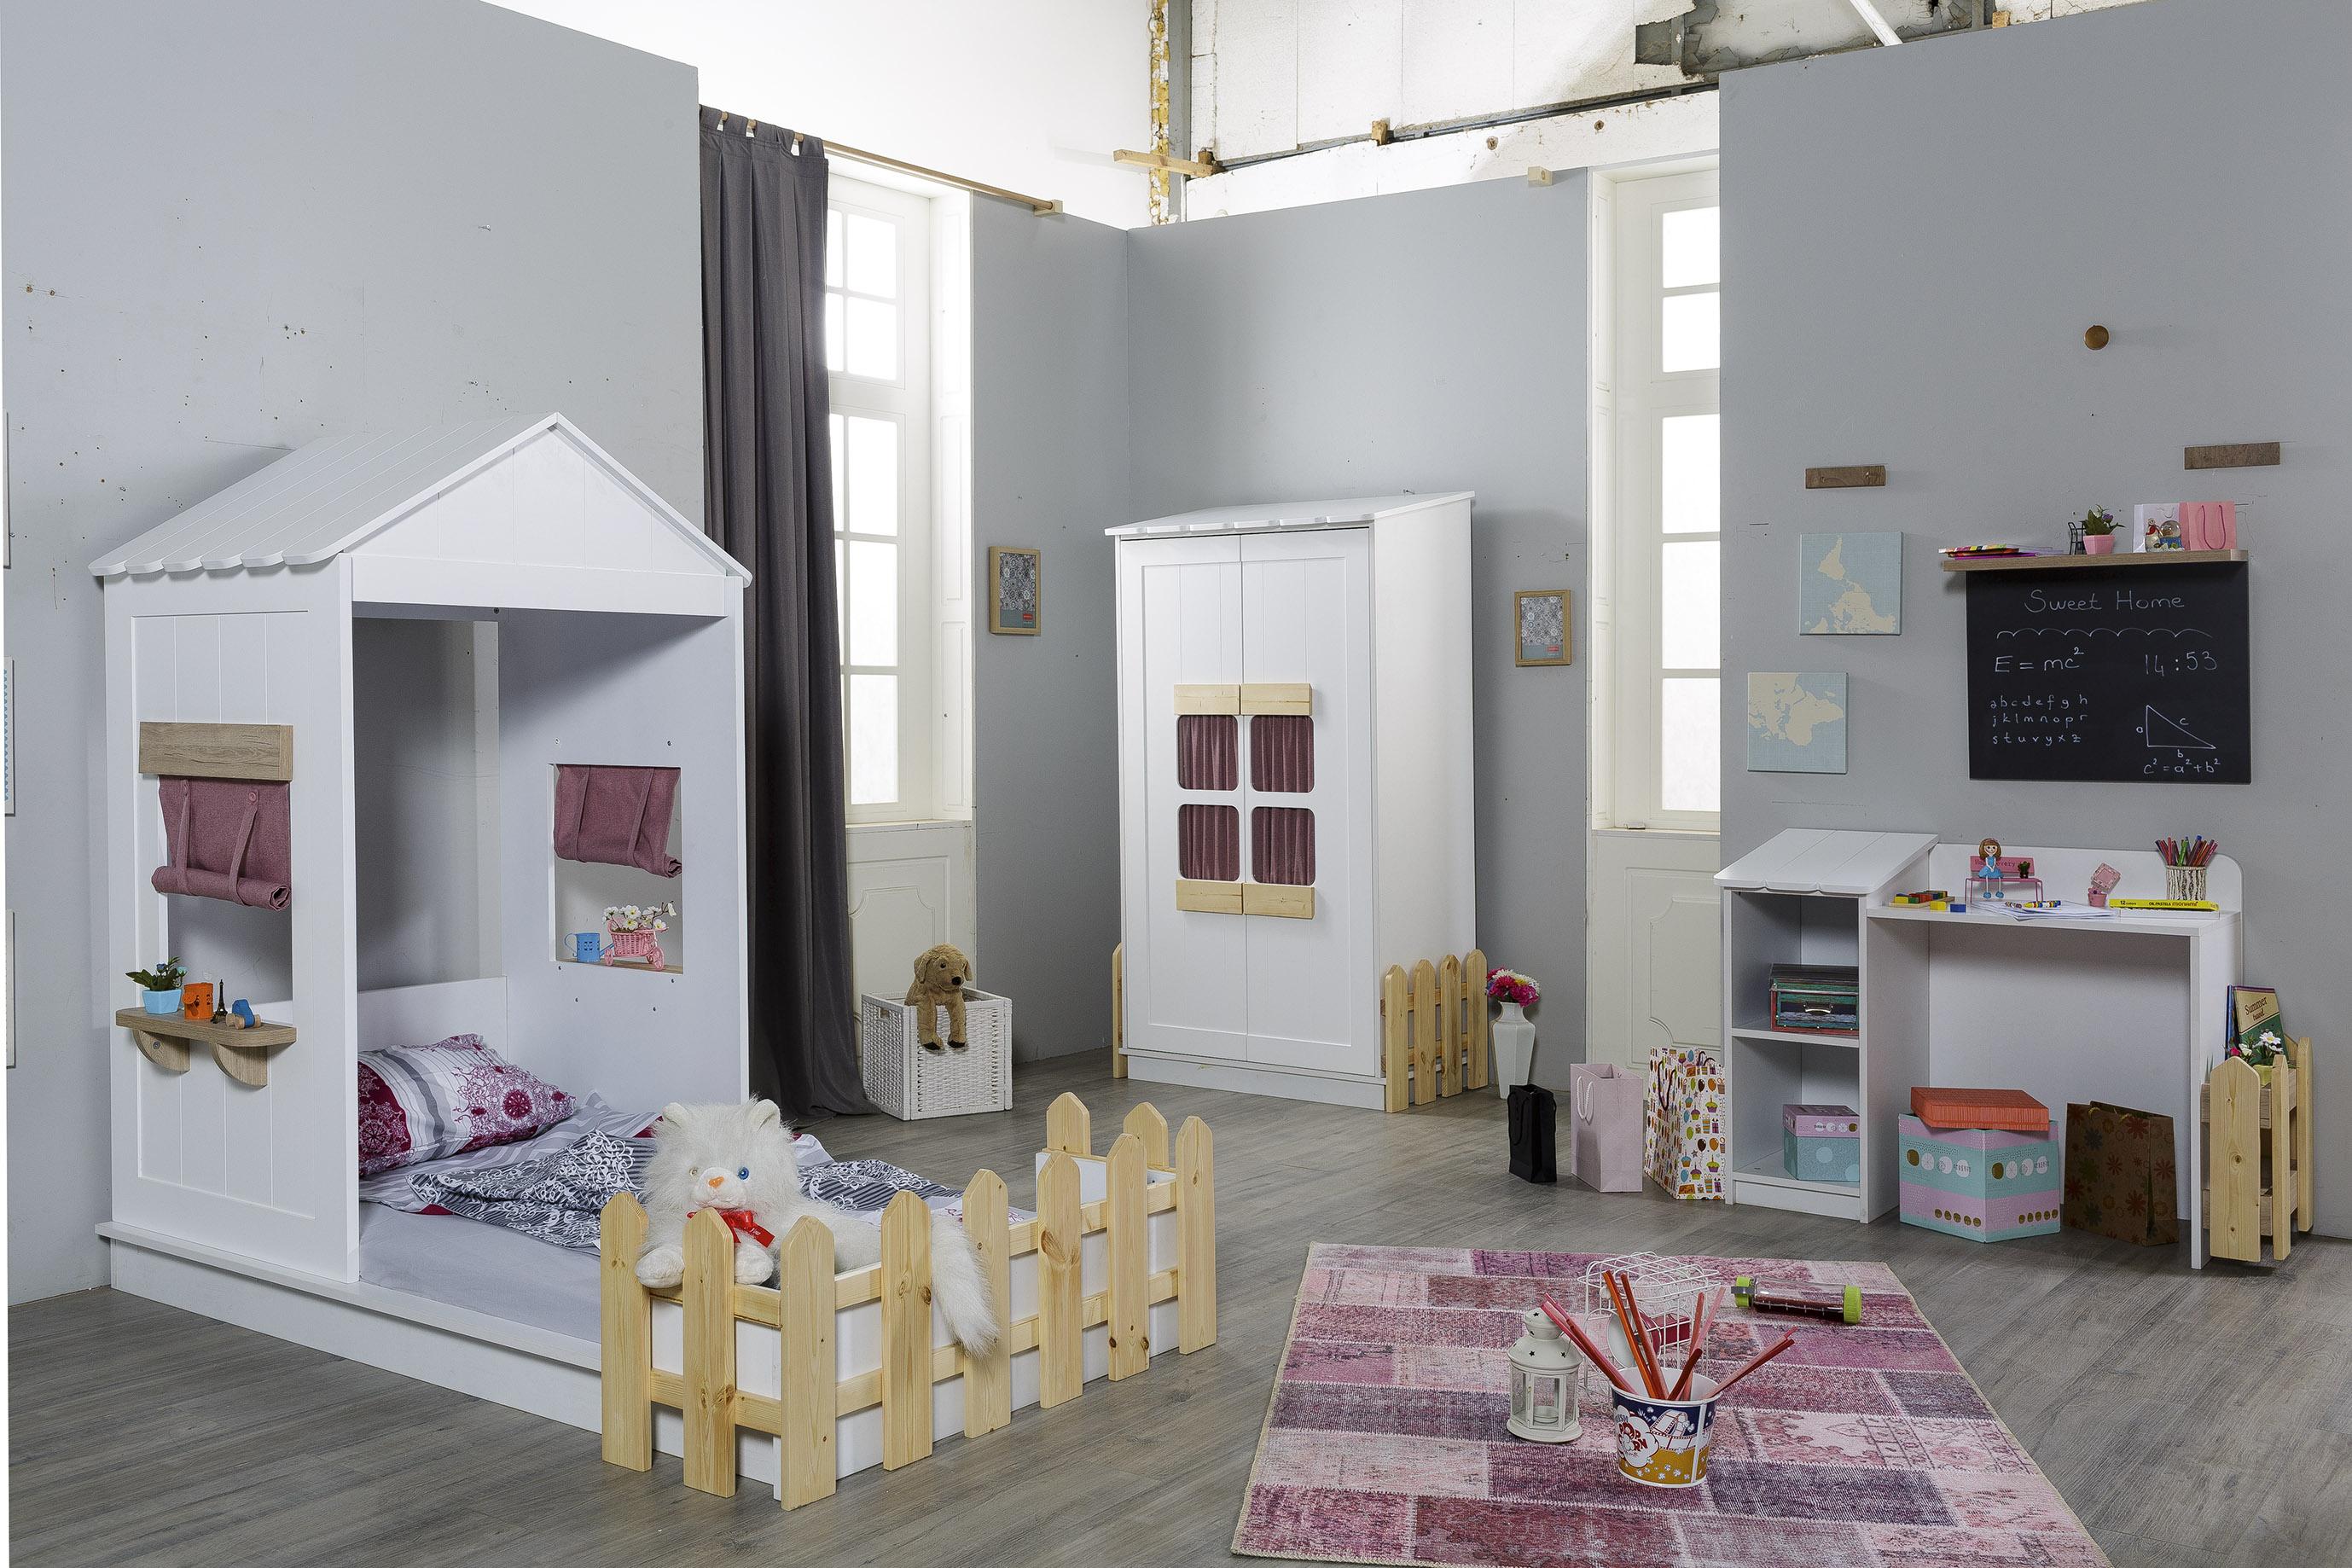 Mädchen-Kinderzimmer Set Sweet Home in Pink